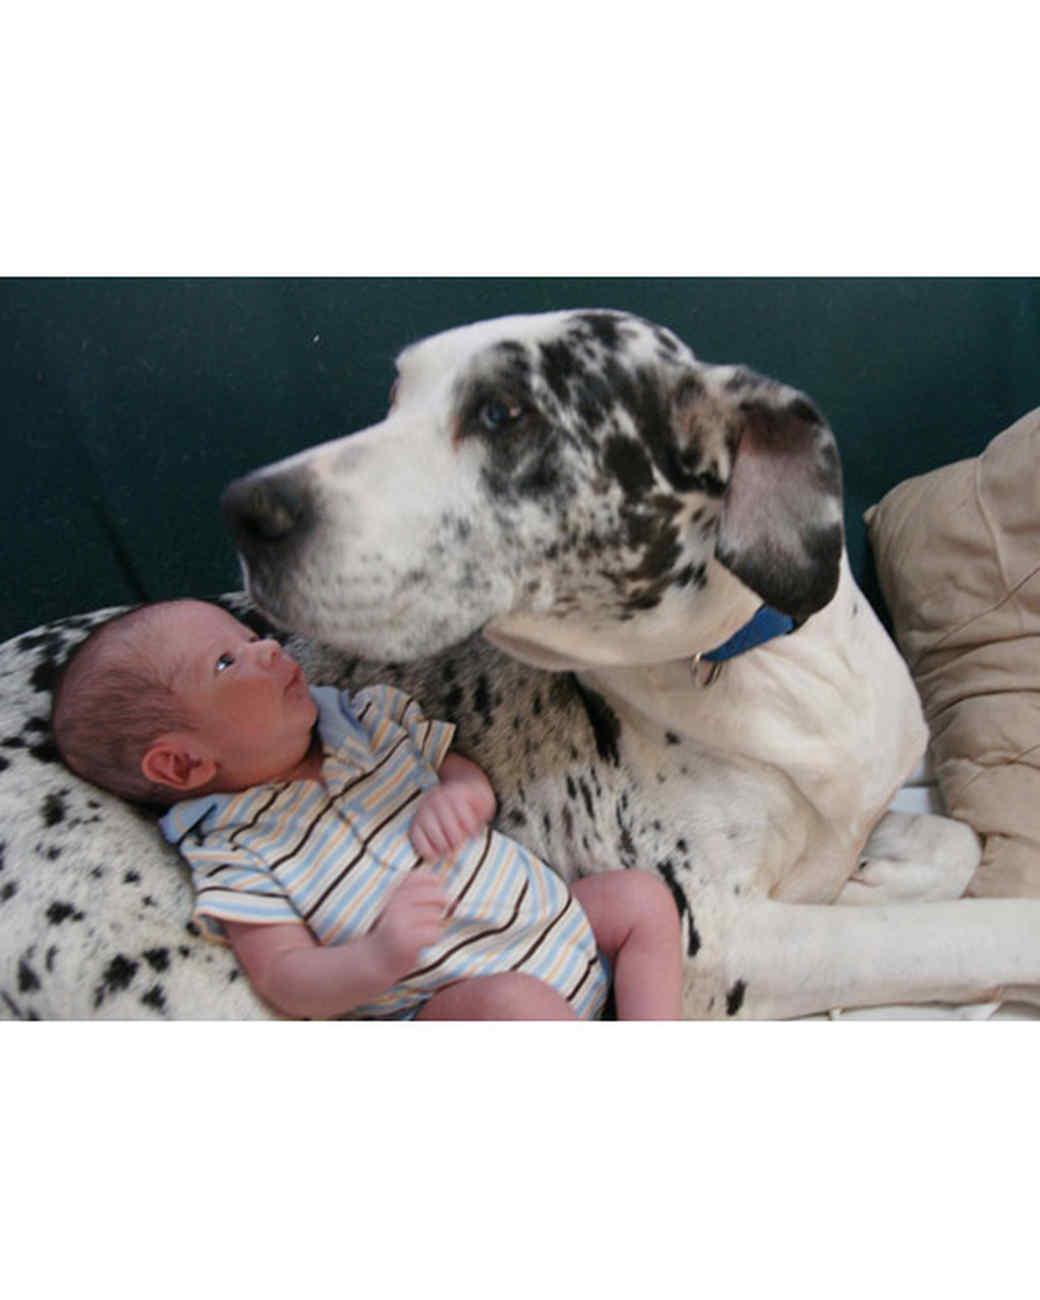 pets_adoption_6170553_122717_13817264.jpg